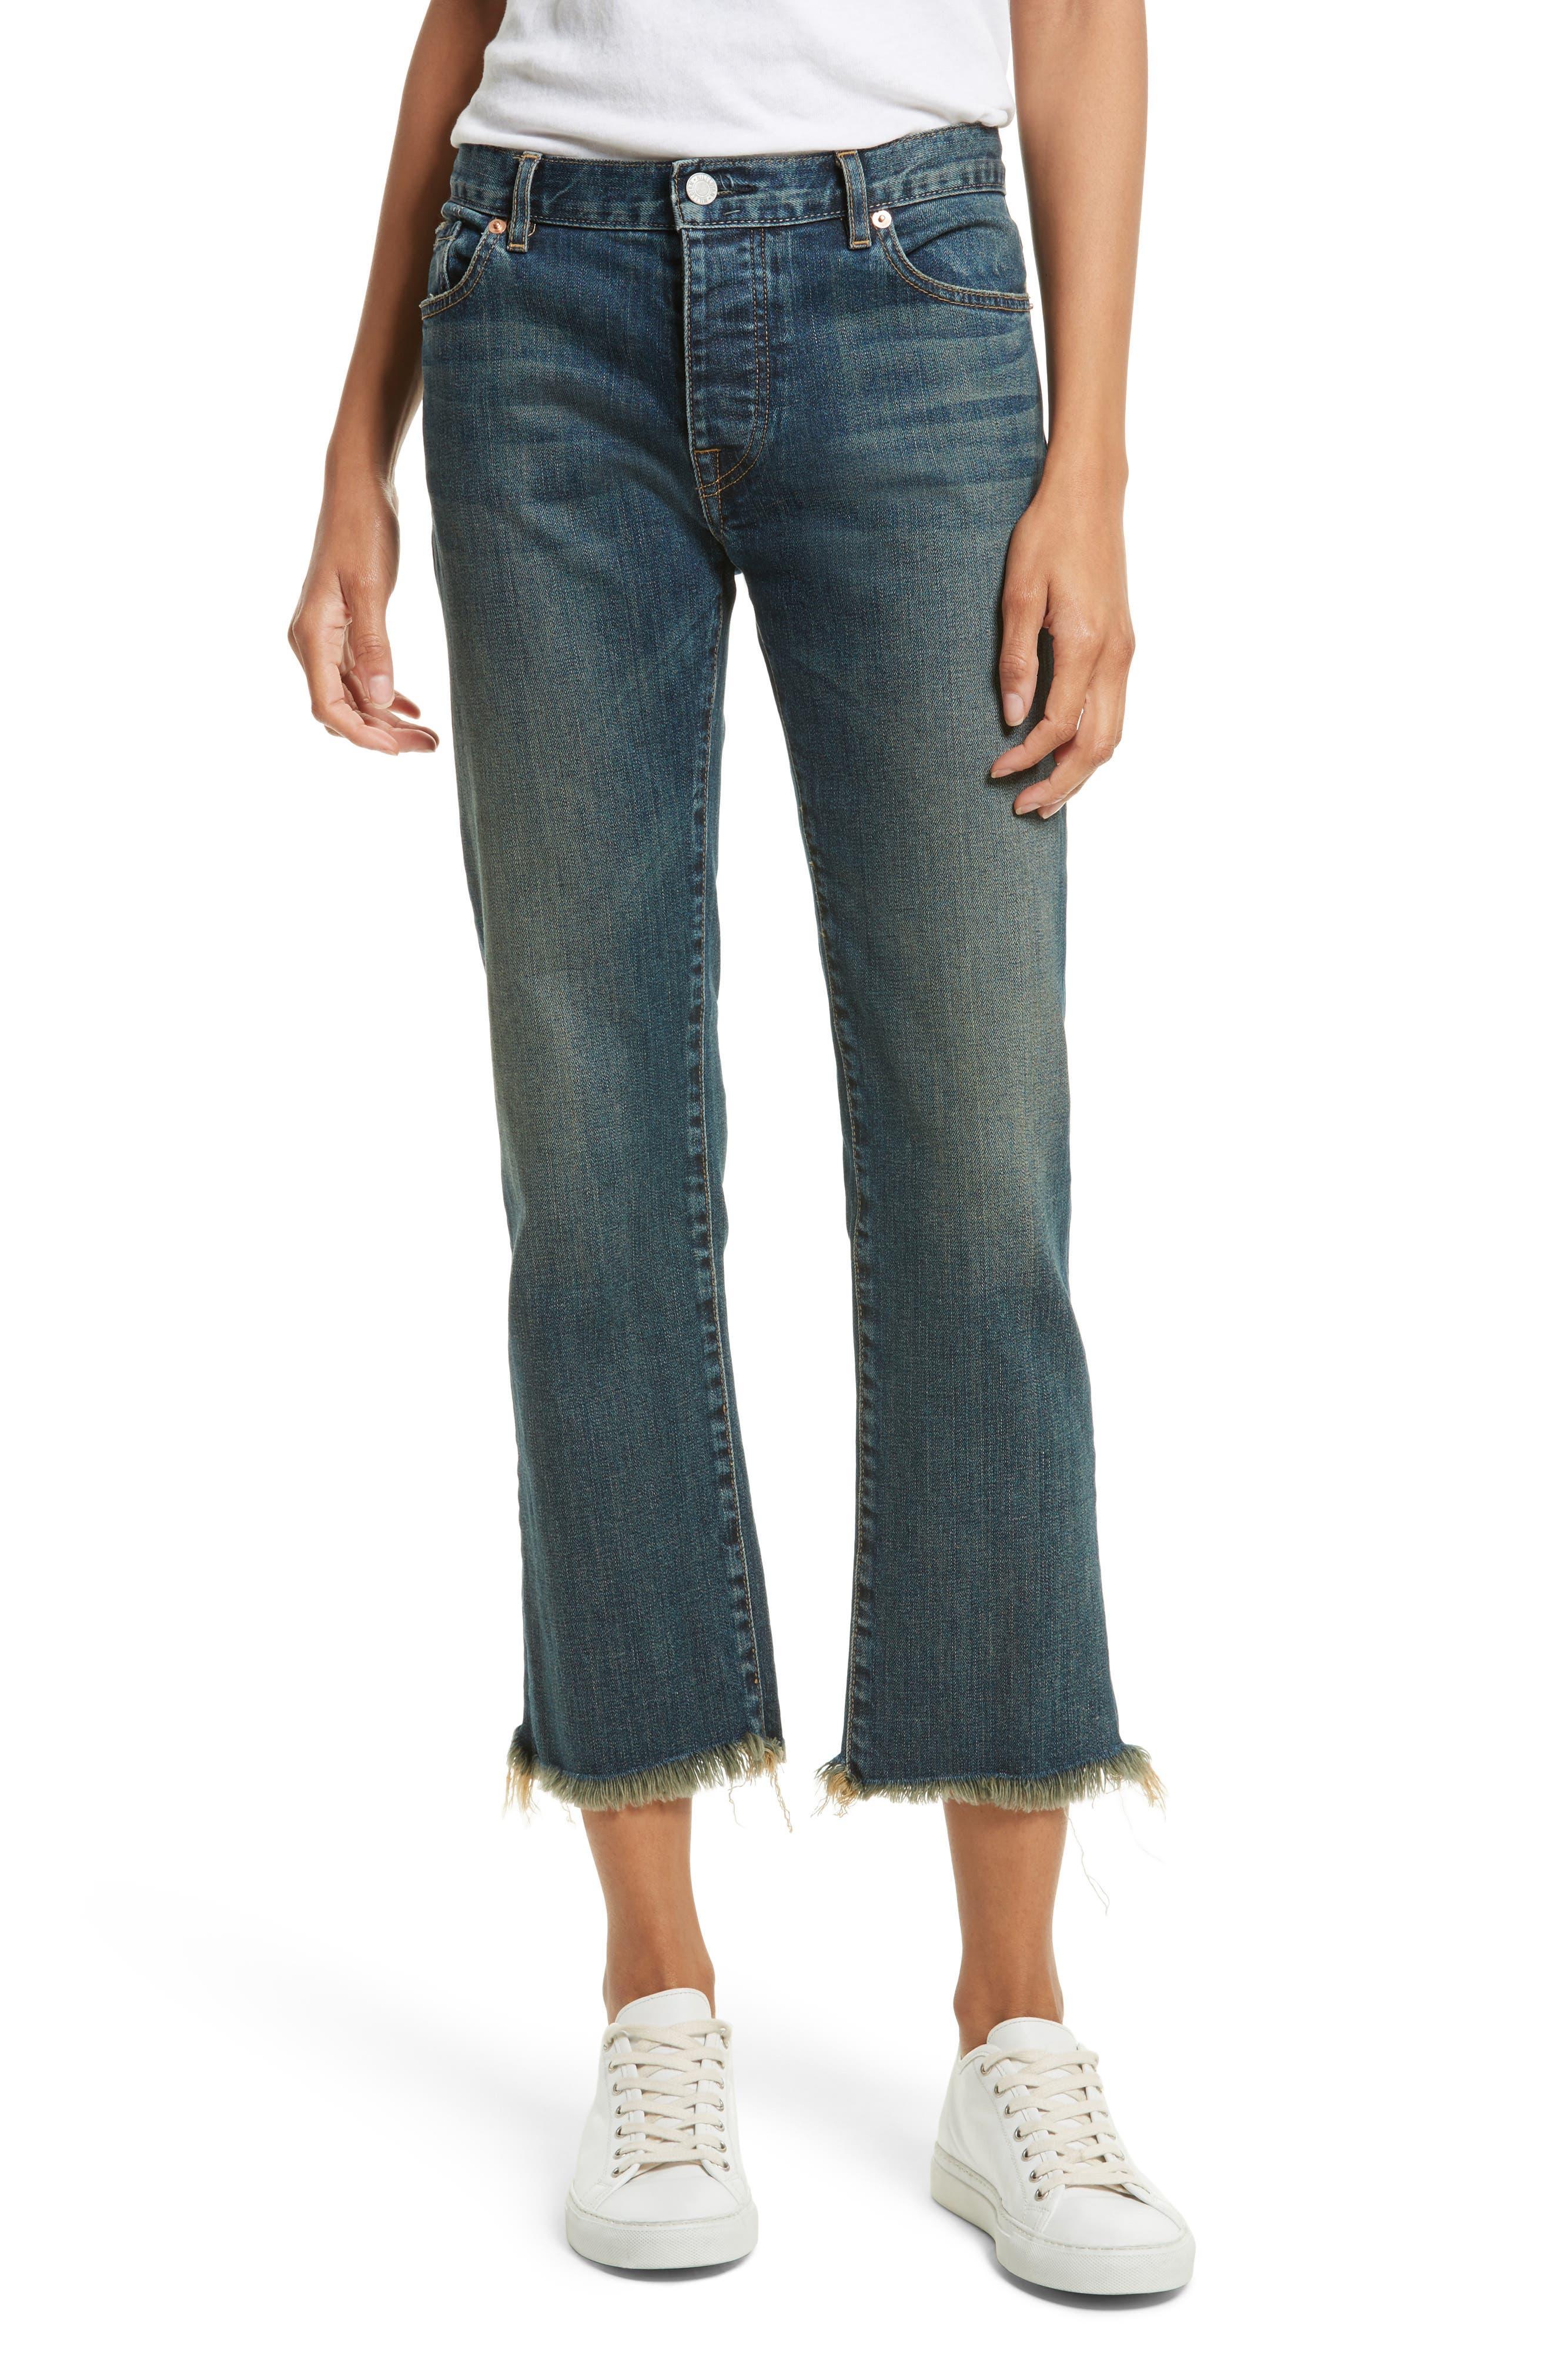 Alternate Image 1 Selected - Nili Lotan Raw Edge Crop Boyfriend Jeans (Walker)